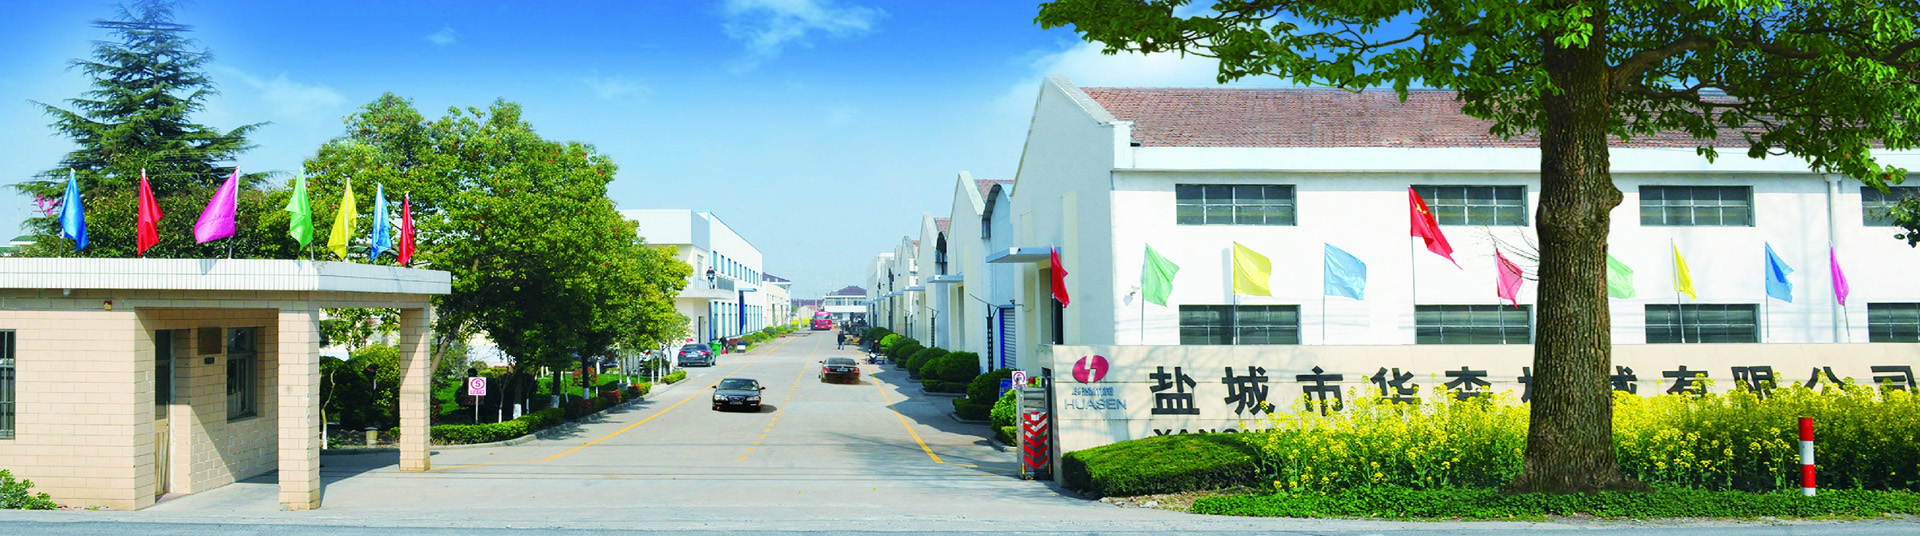 Yancheng City Huasen Machinery Co., Ltd.